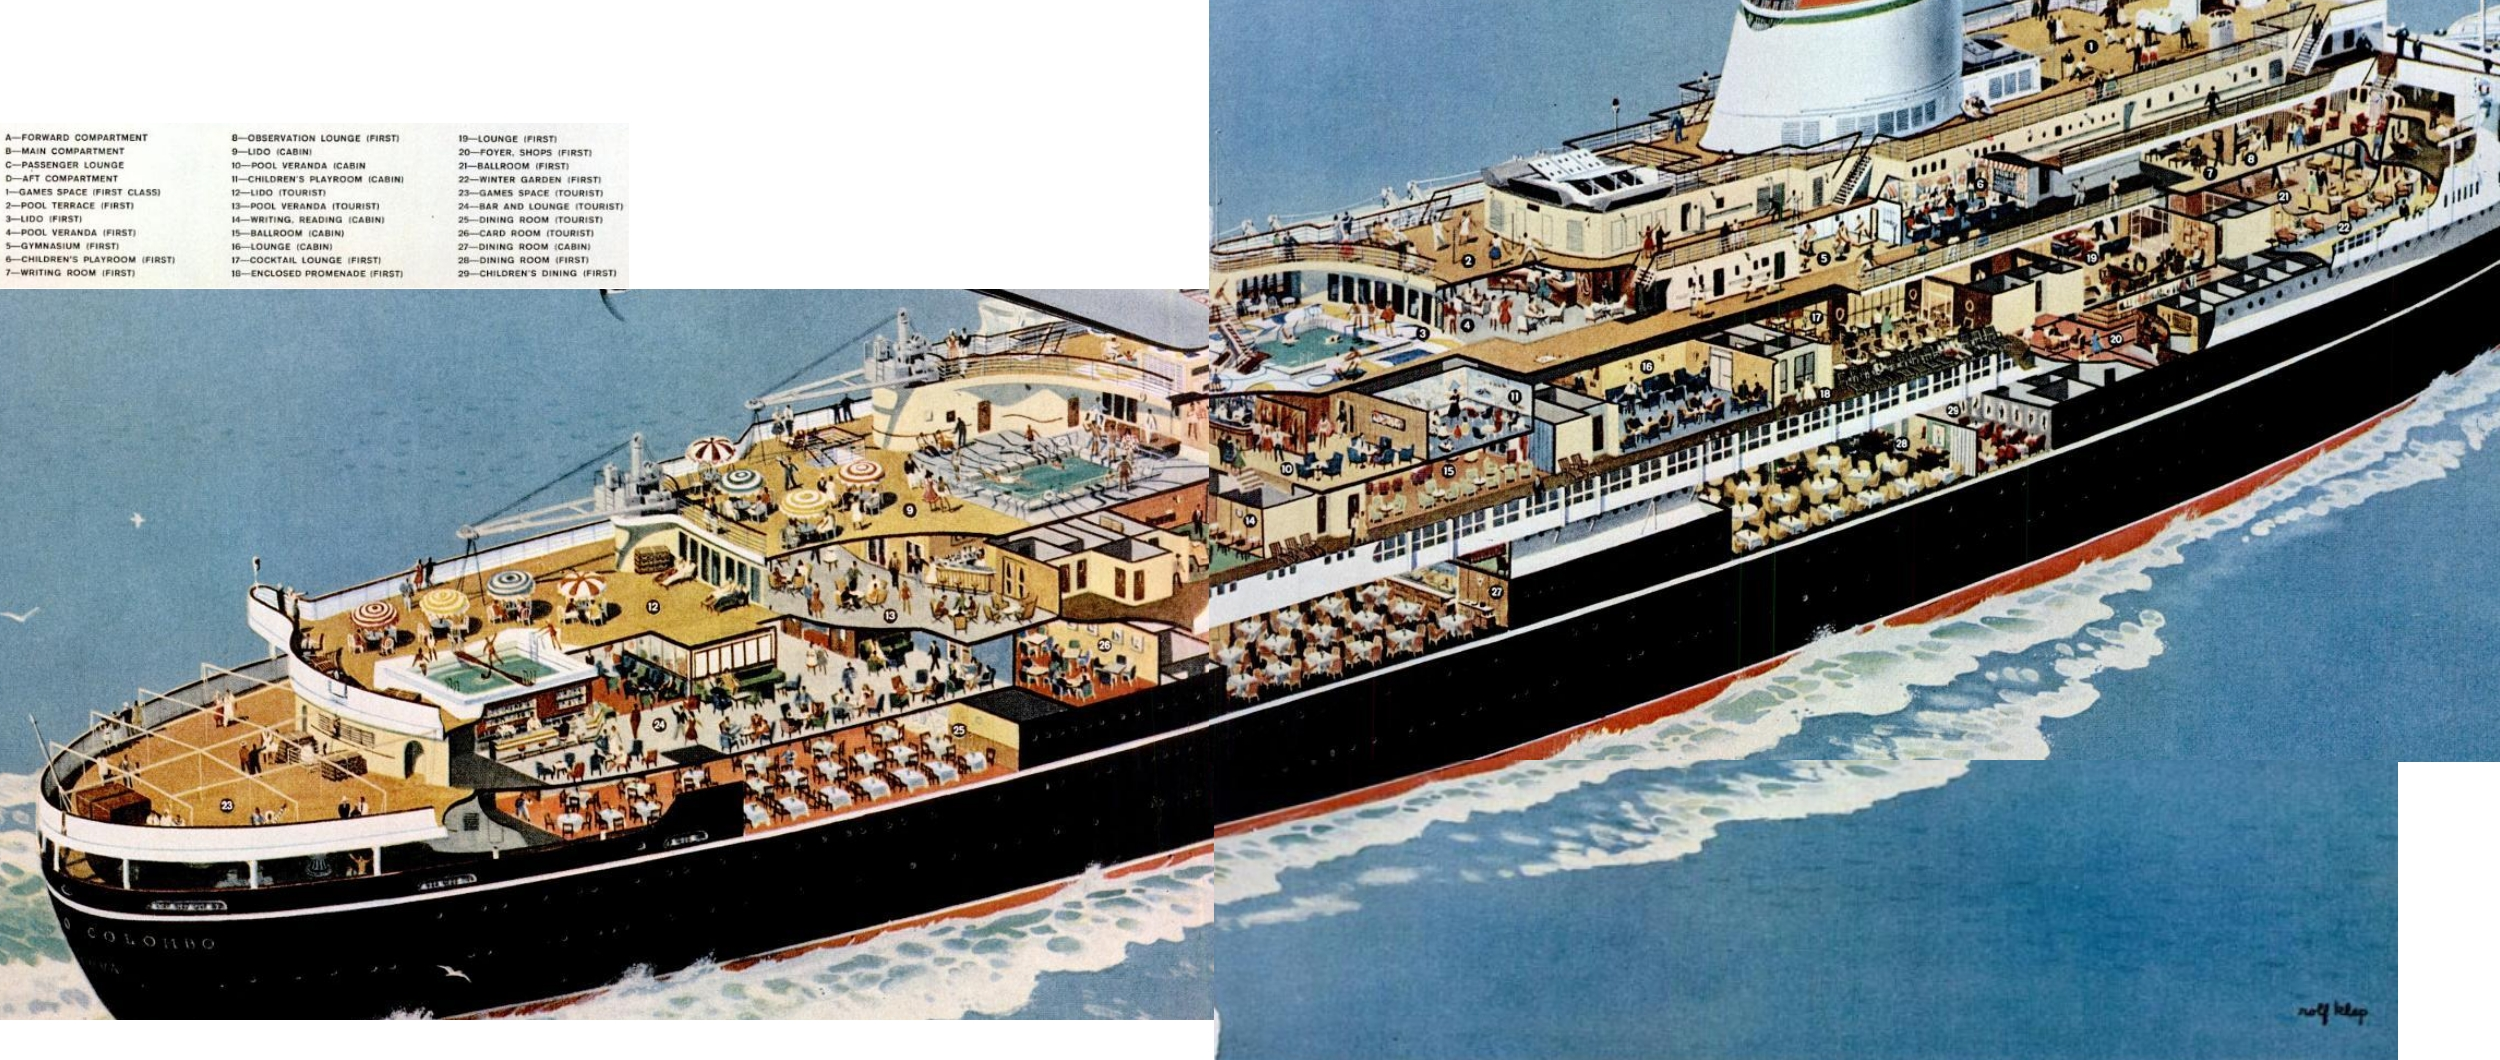 Oceanliner Cristoforo Columbo Cutaway, 1955